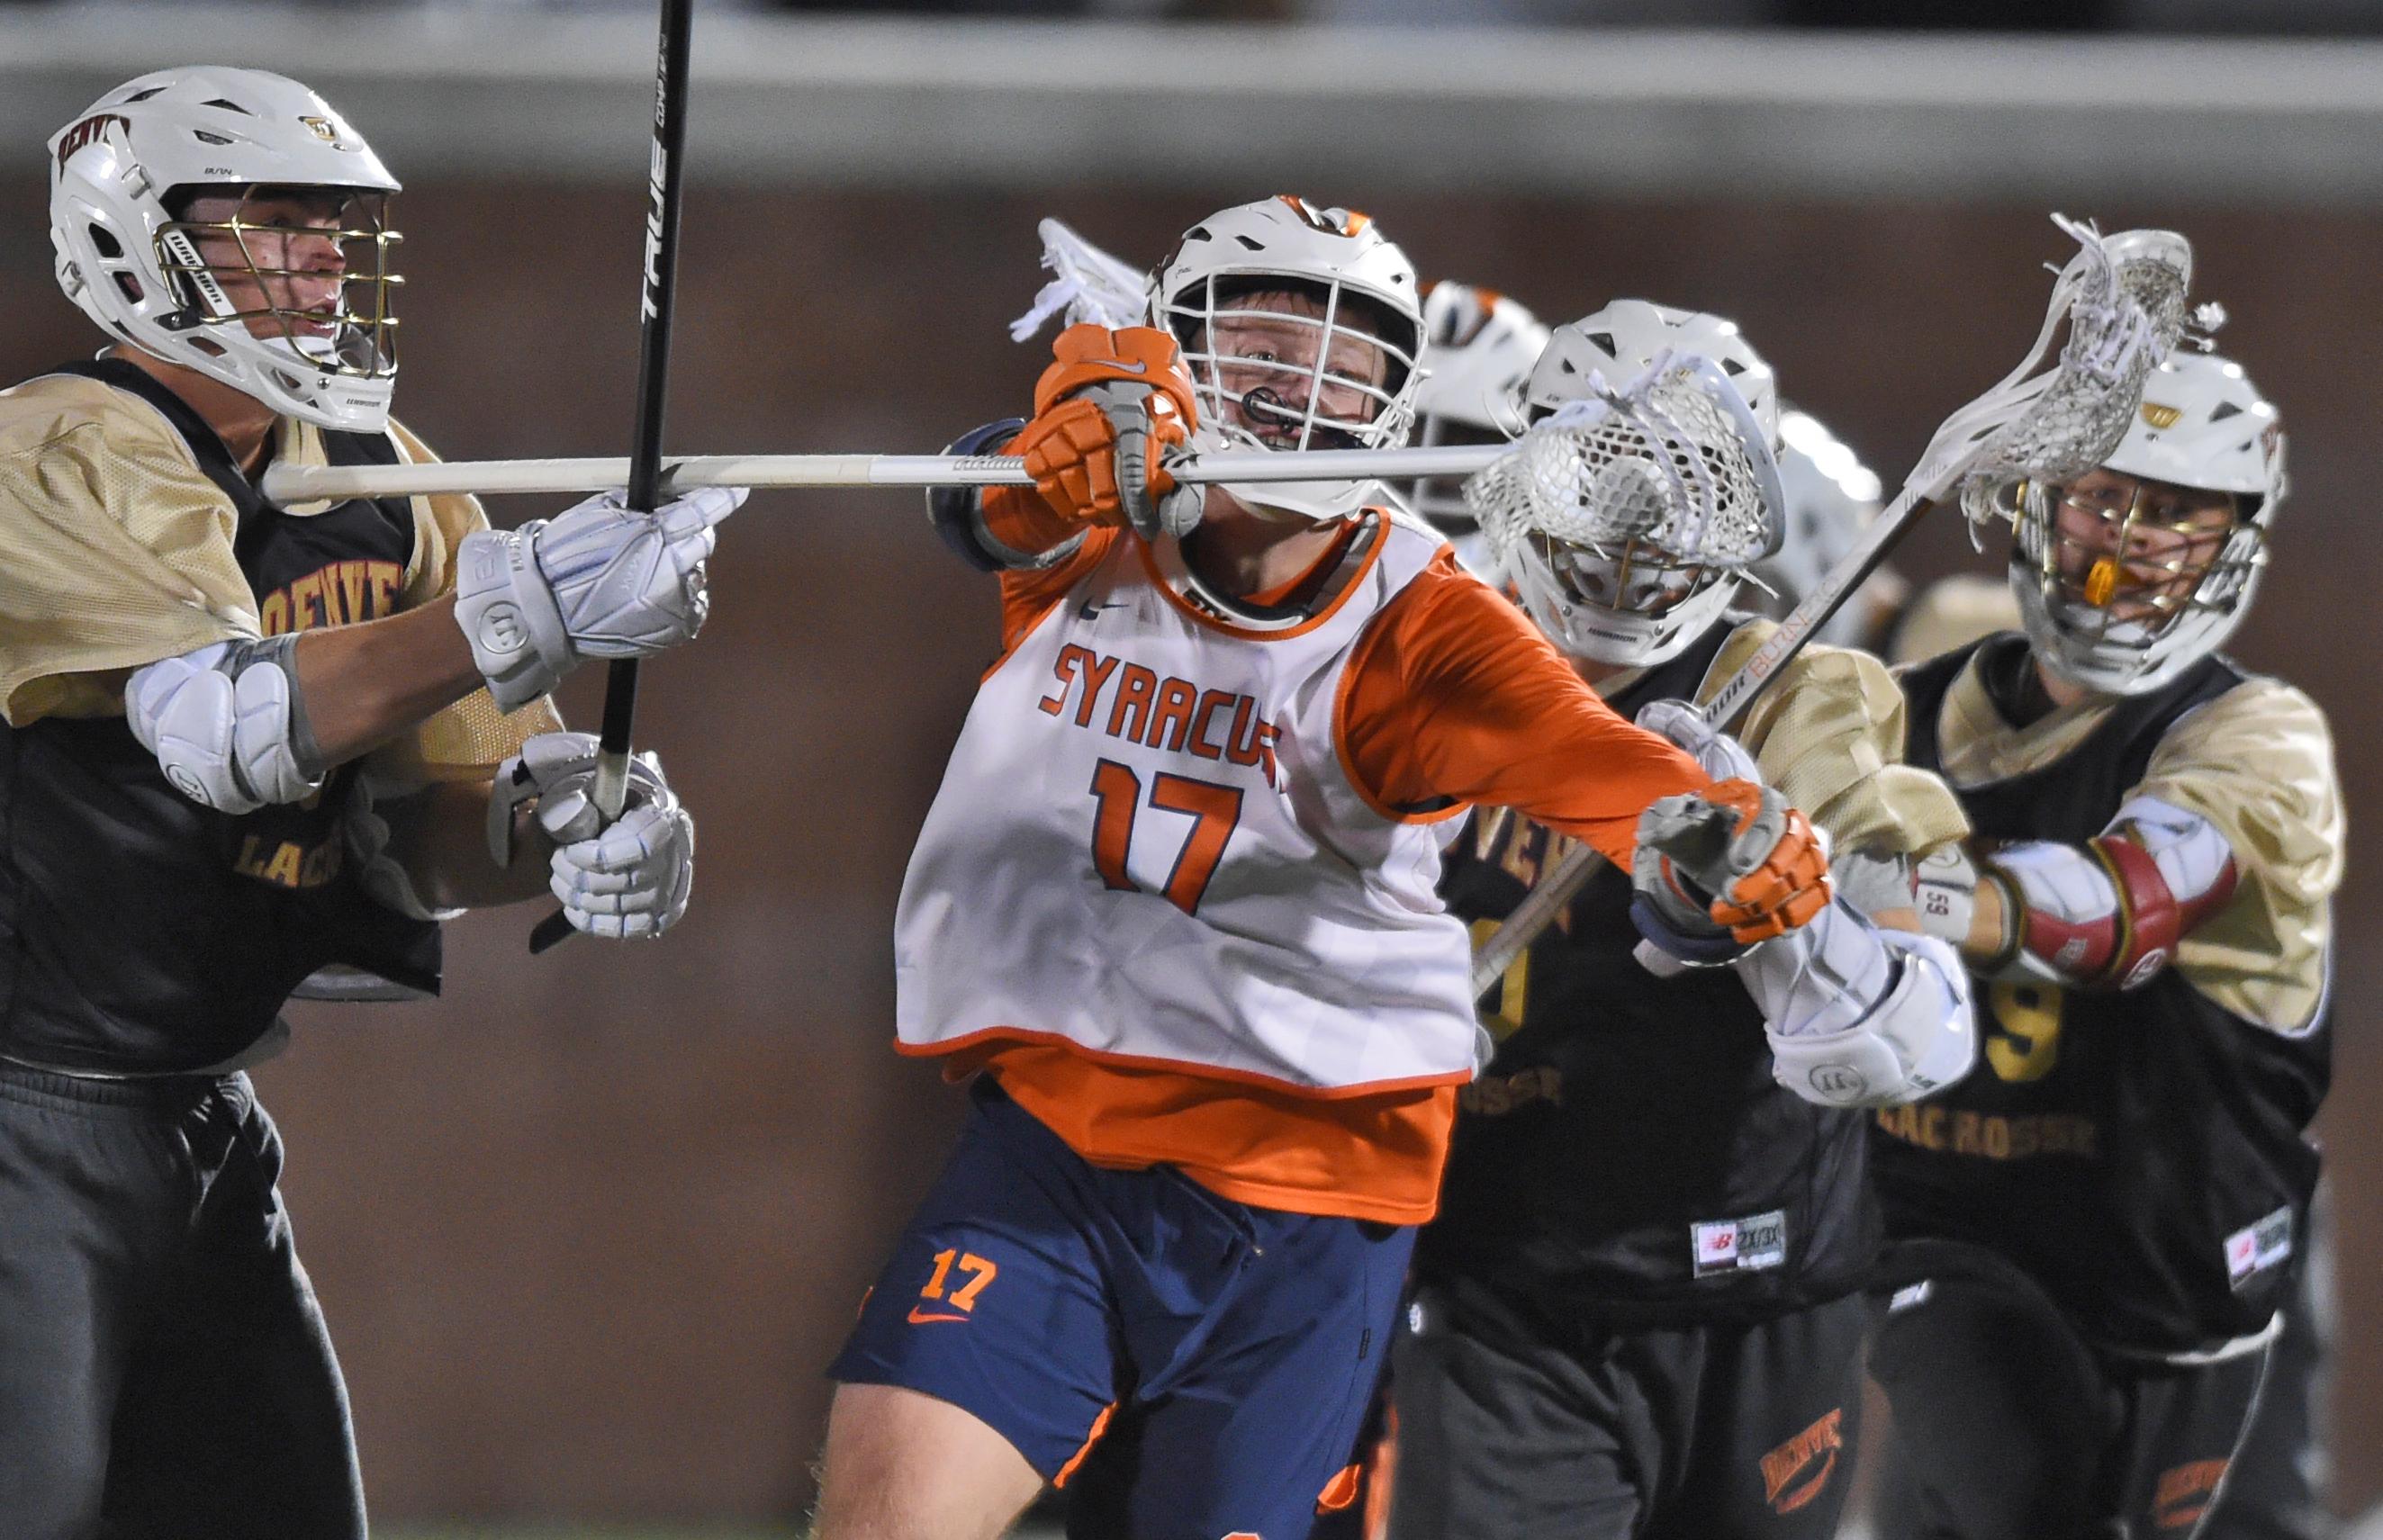 Dordevic scores twice as Syracuse lacrosse ties Denver in scrimmage